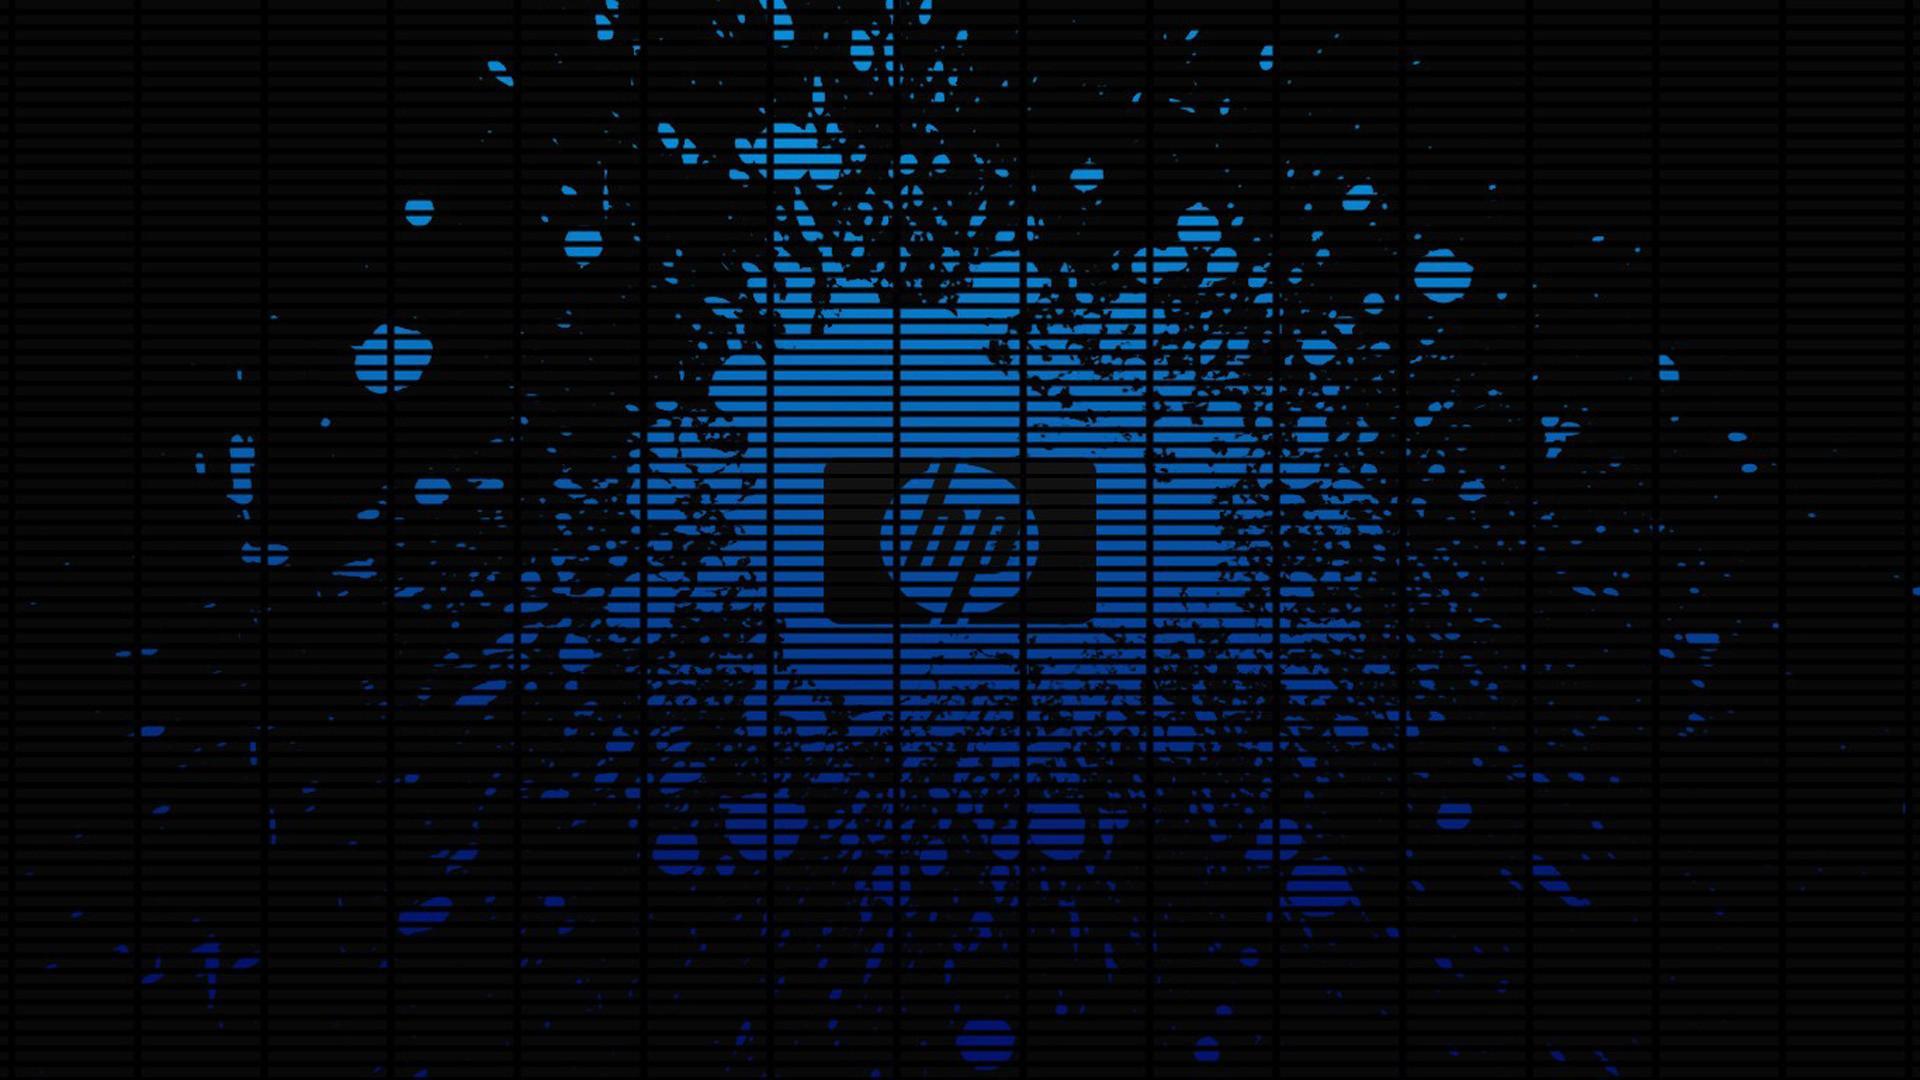 Graffiti Wallpaper For Iphone 5 Hp Backgrounds Download Pixelstalk Net